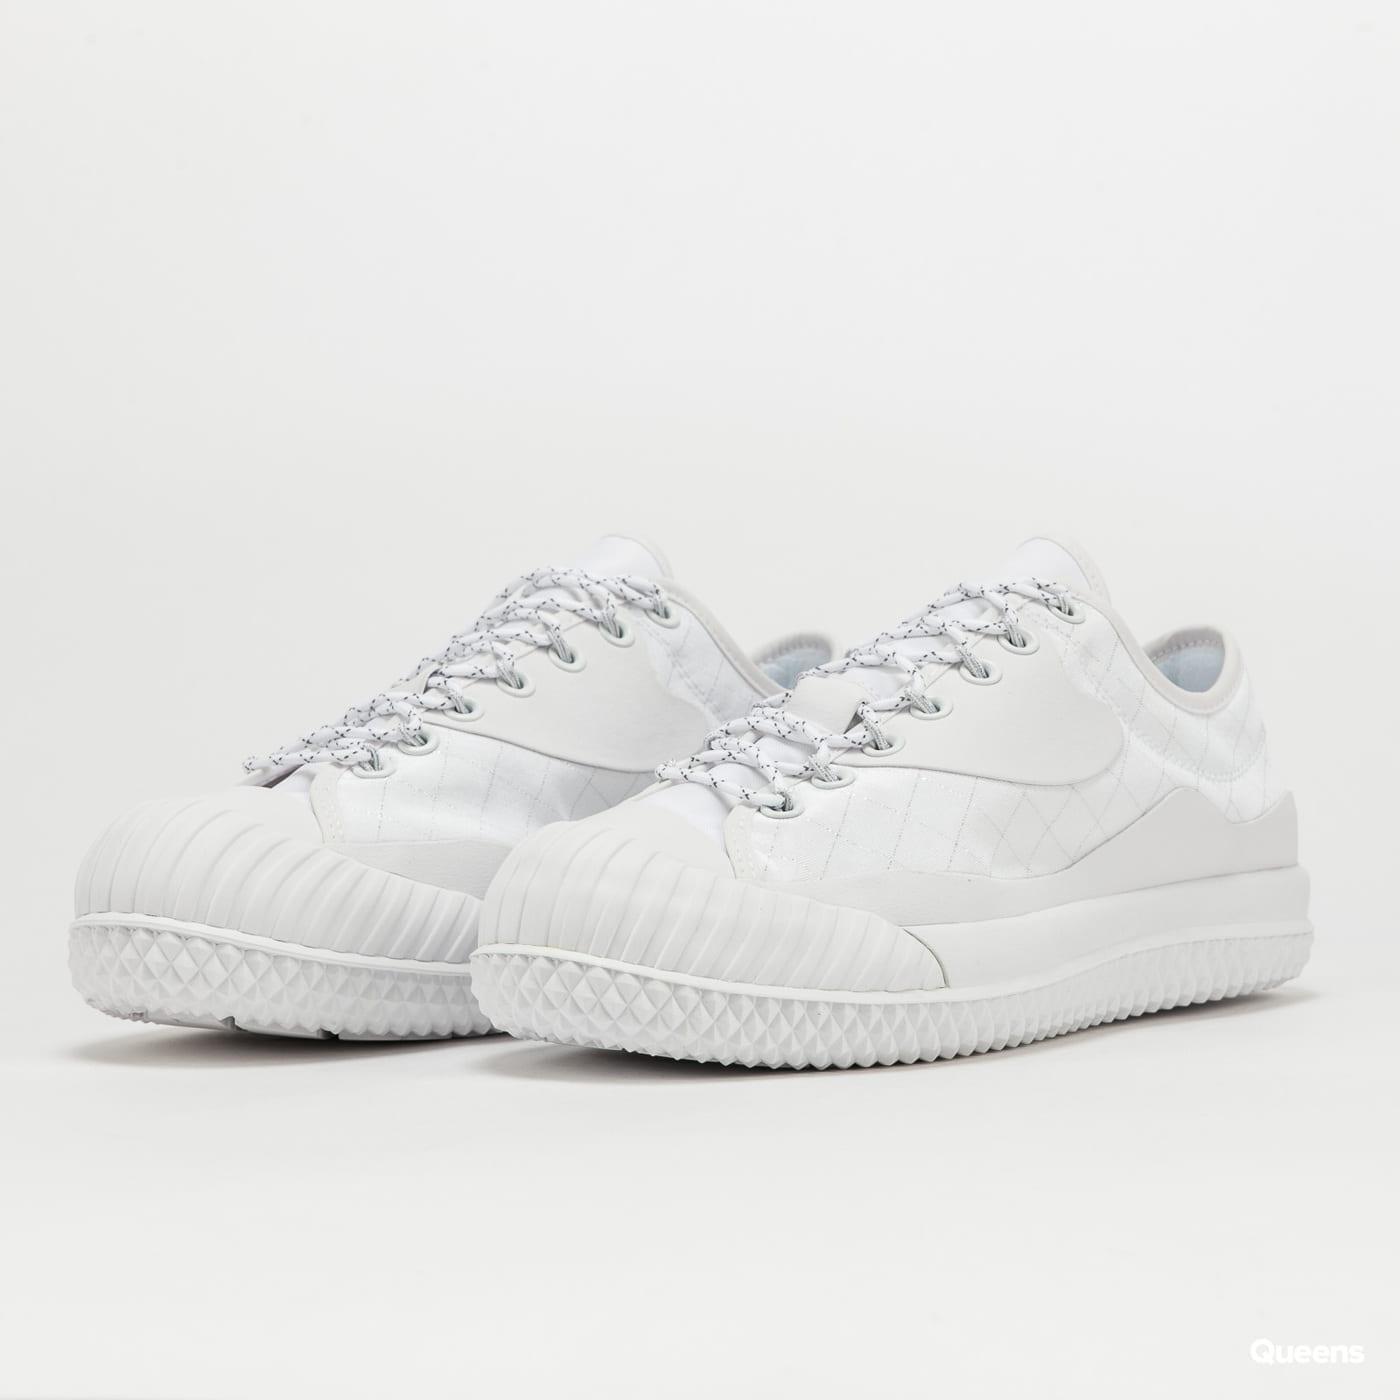 Converse Slam Jam Bosey MC OX white / white / white